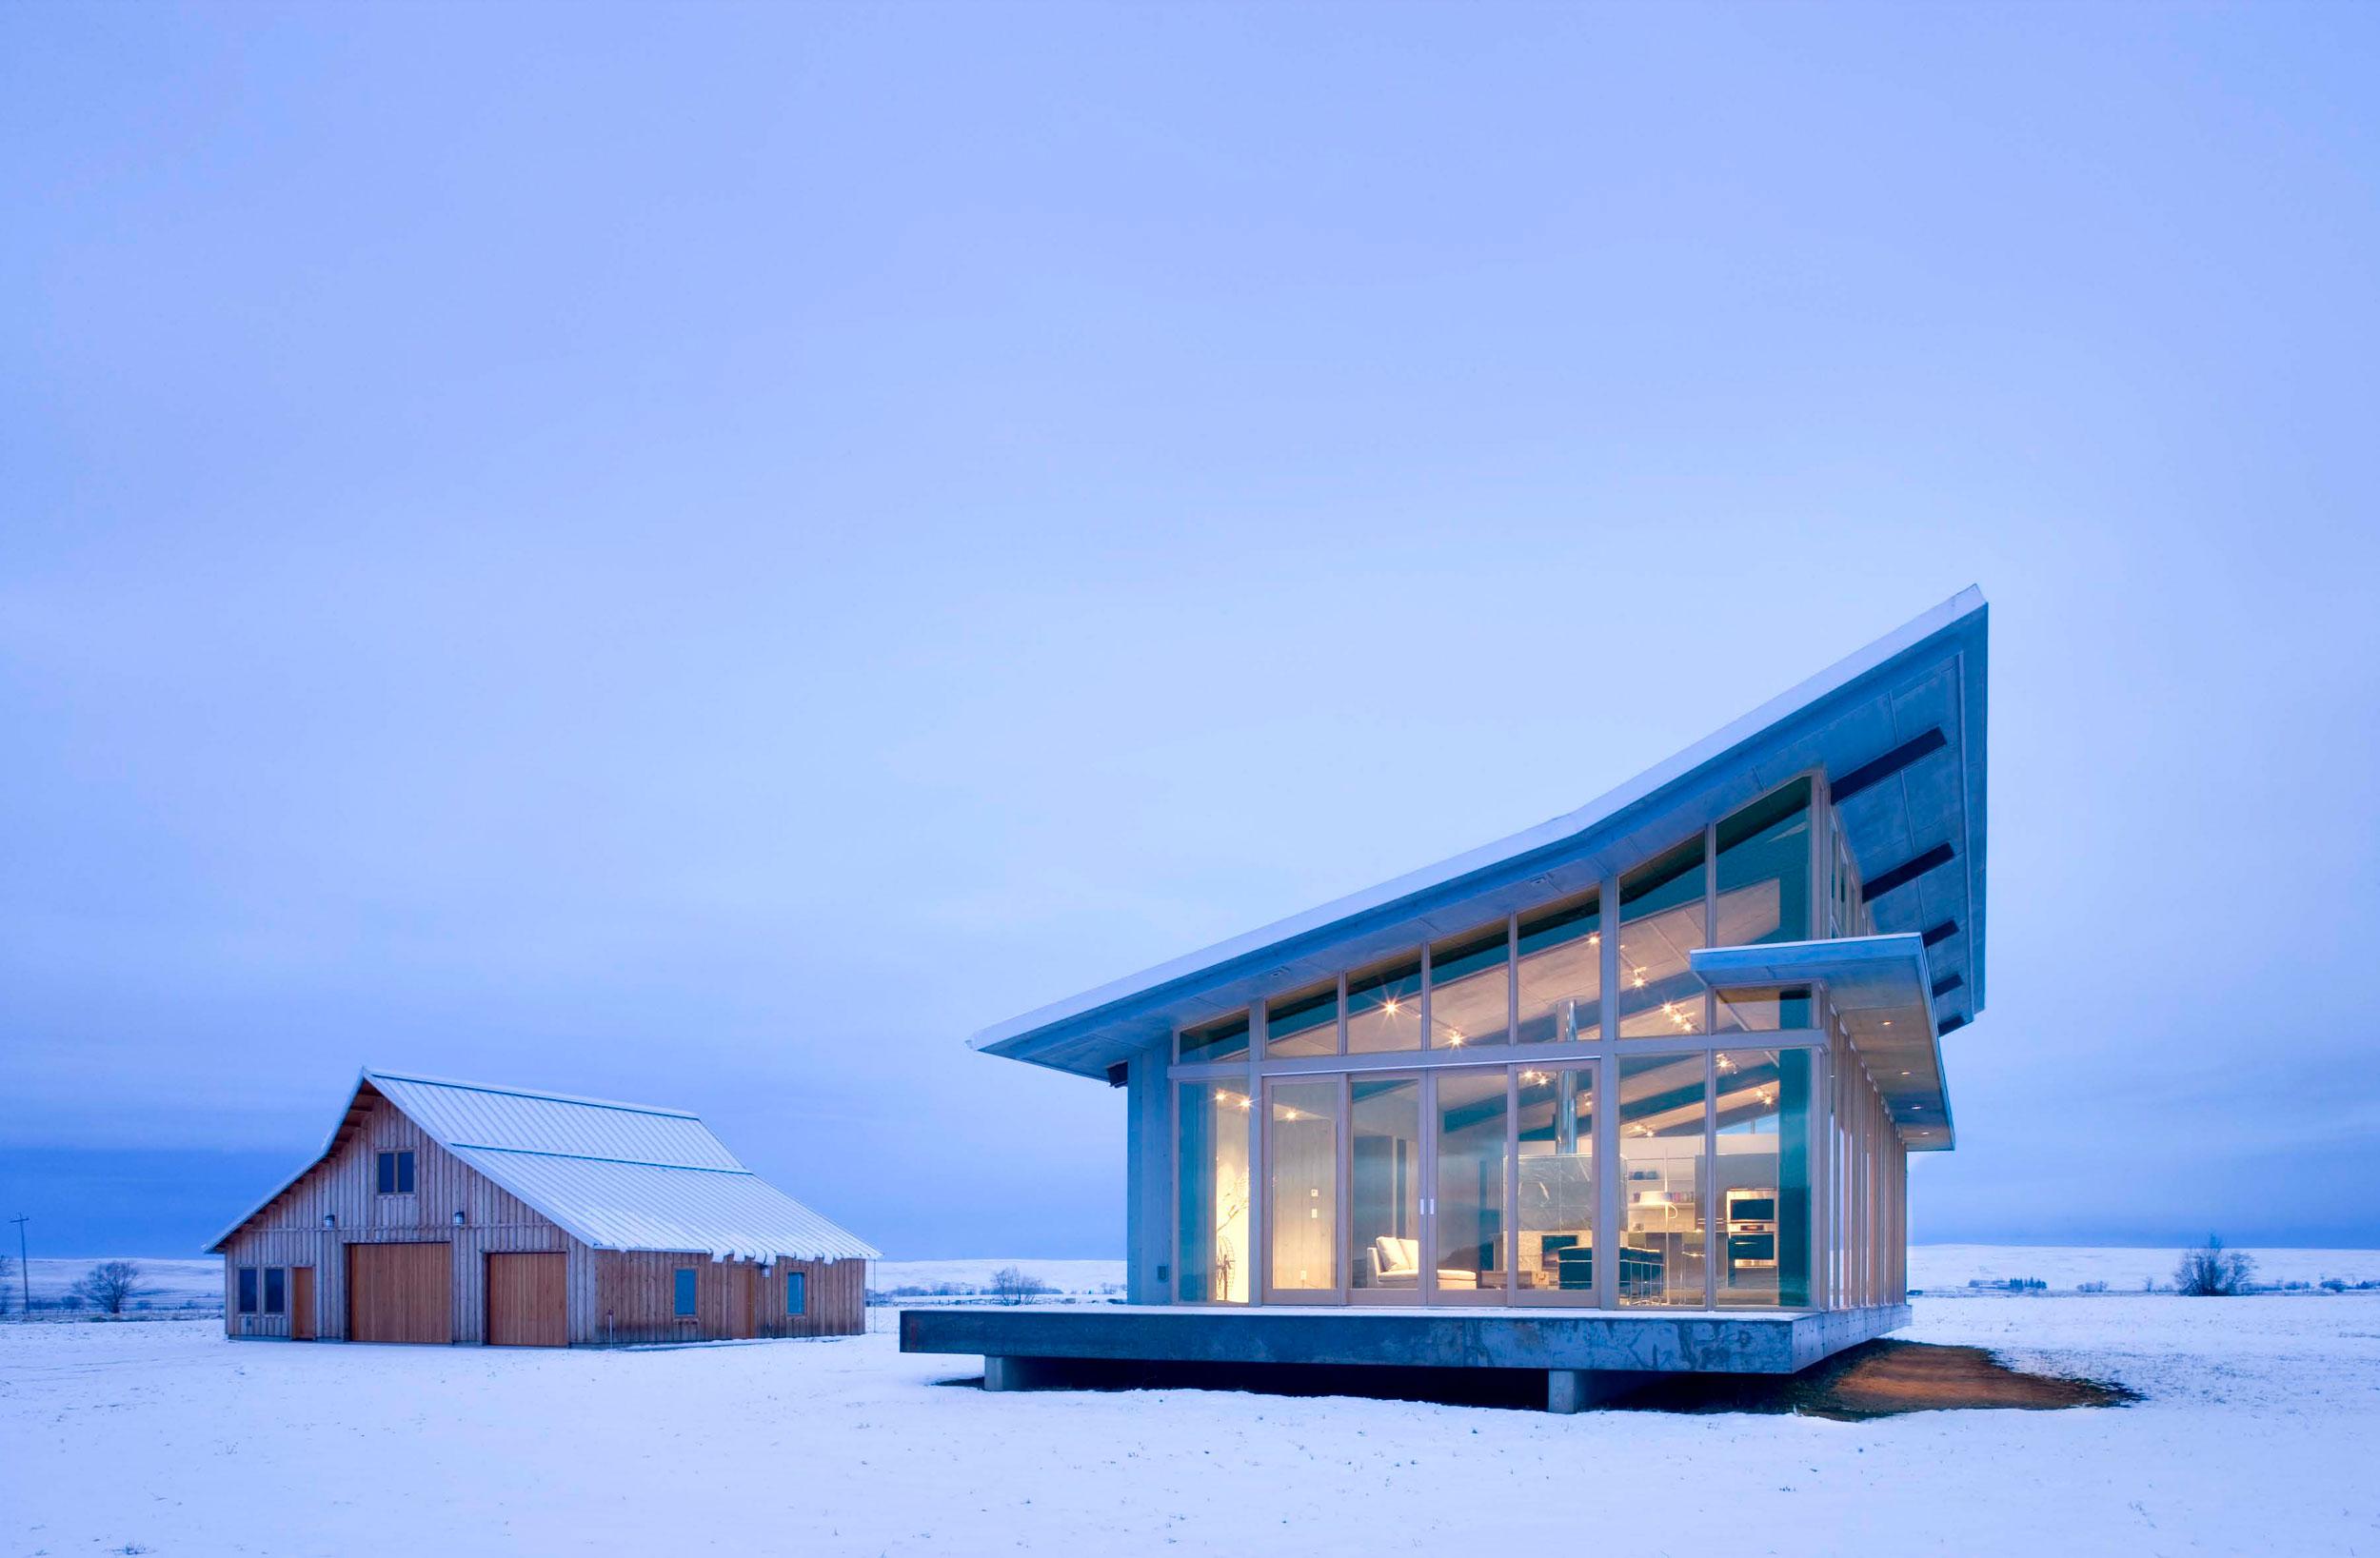 Lighting, Snow, Glass Farmhouse in Northeast Oregon